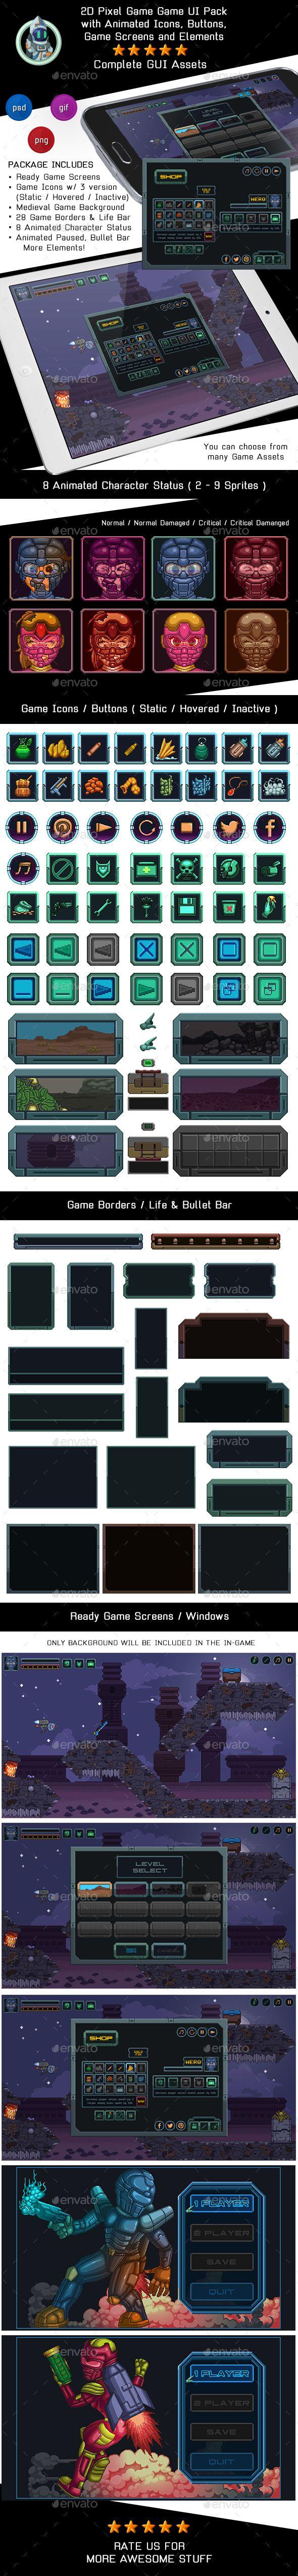 45+ Pixel buttons information